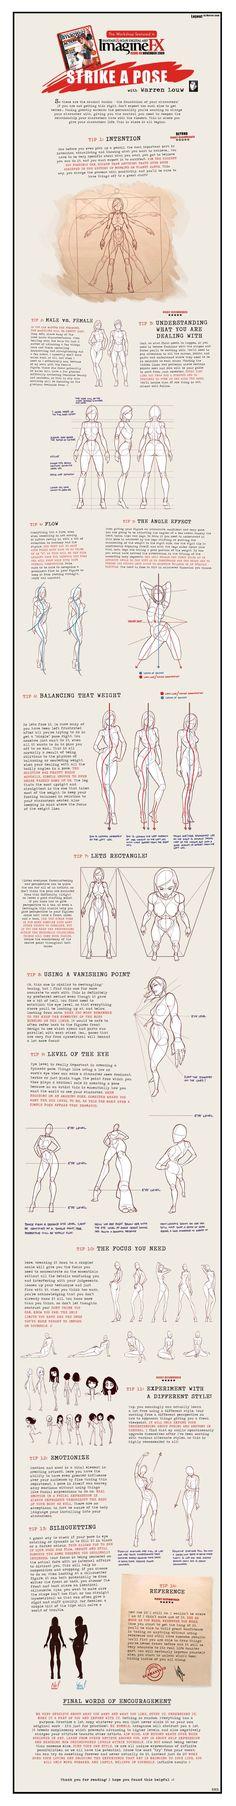 IFX - Strike A Pose by WarrenLouw.deviantart.com #deviantART